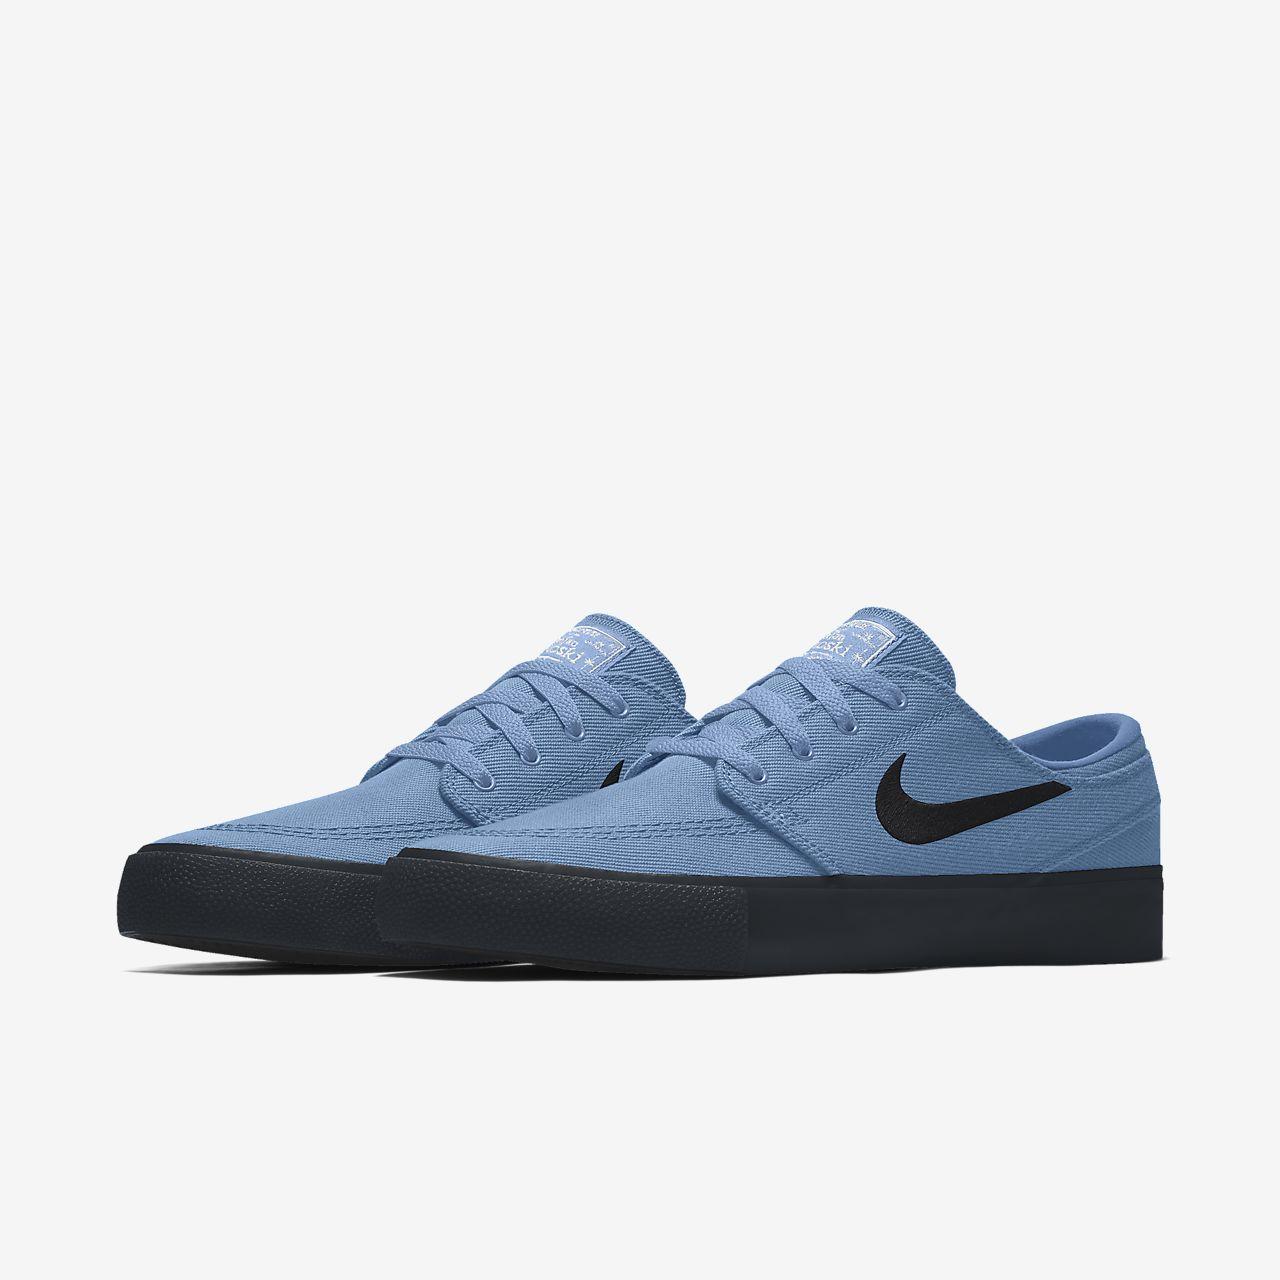 Provide Nike Trainers Nike Sb Zoom Stefan Janoski Slip On